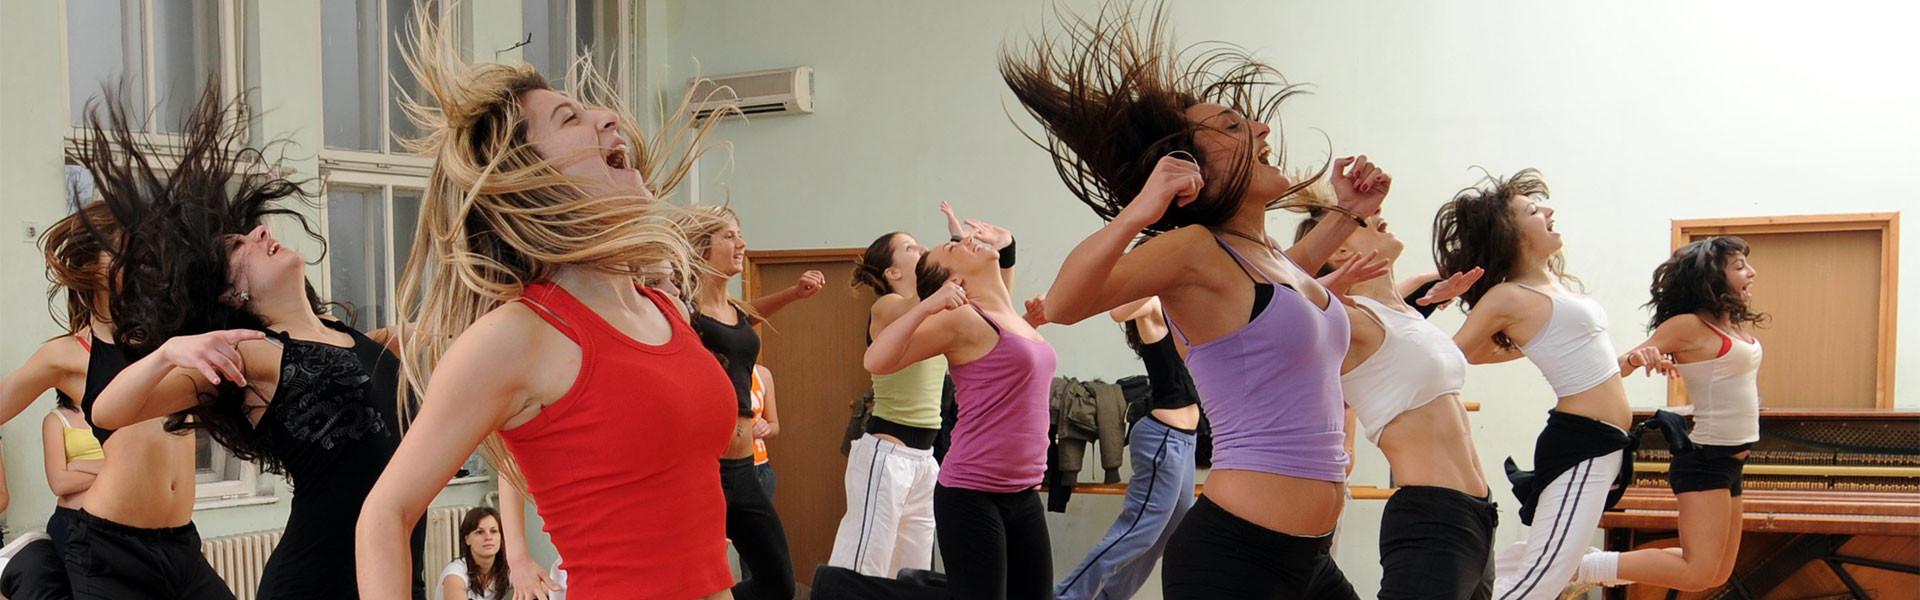 elte-aerobik-joga-fitness-zumba